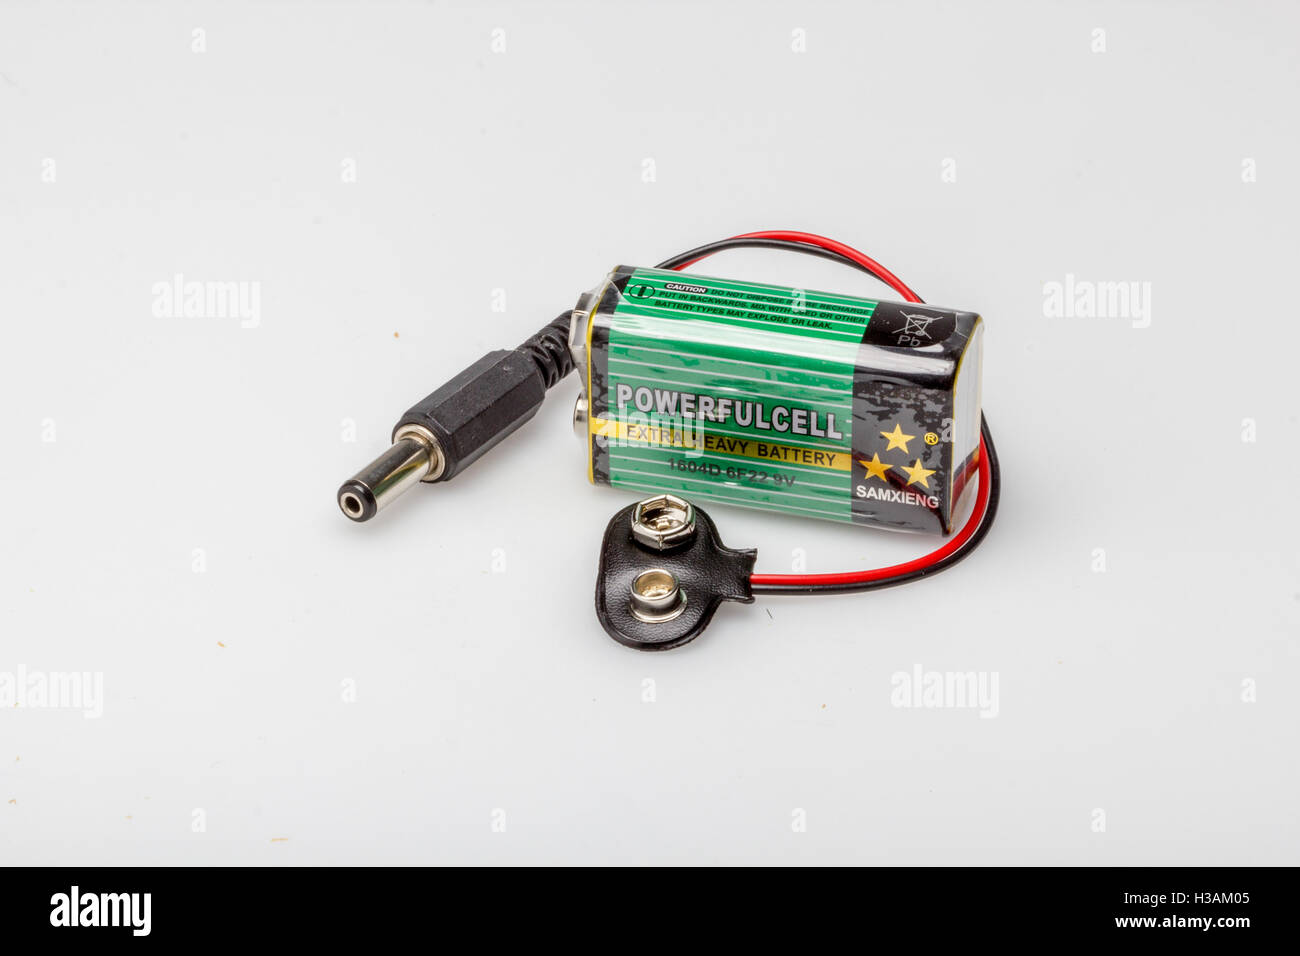 Operating A Normal Hobby Servo Motor Rated At 48v To 6v From 9v Wiring 12v Battery Would Damage